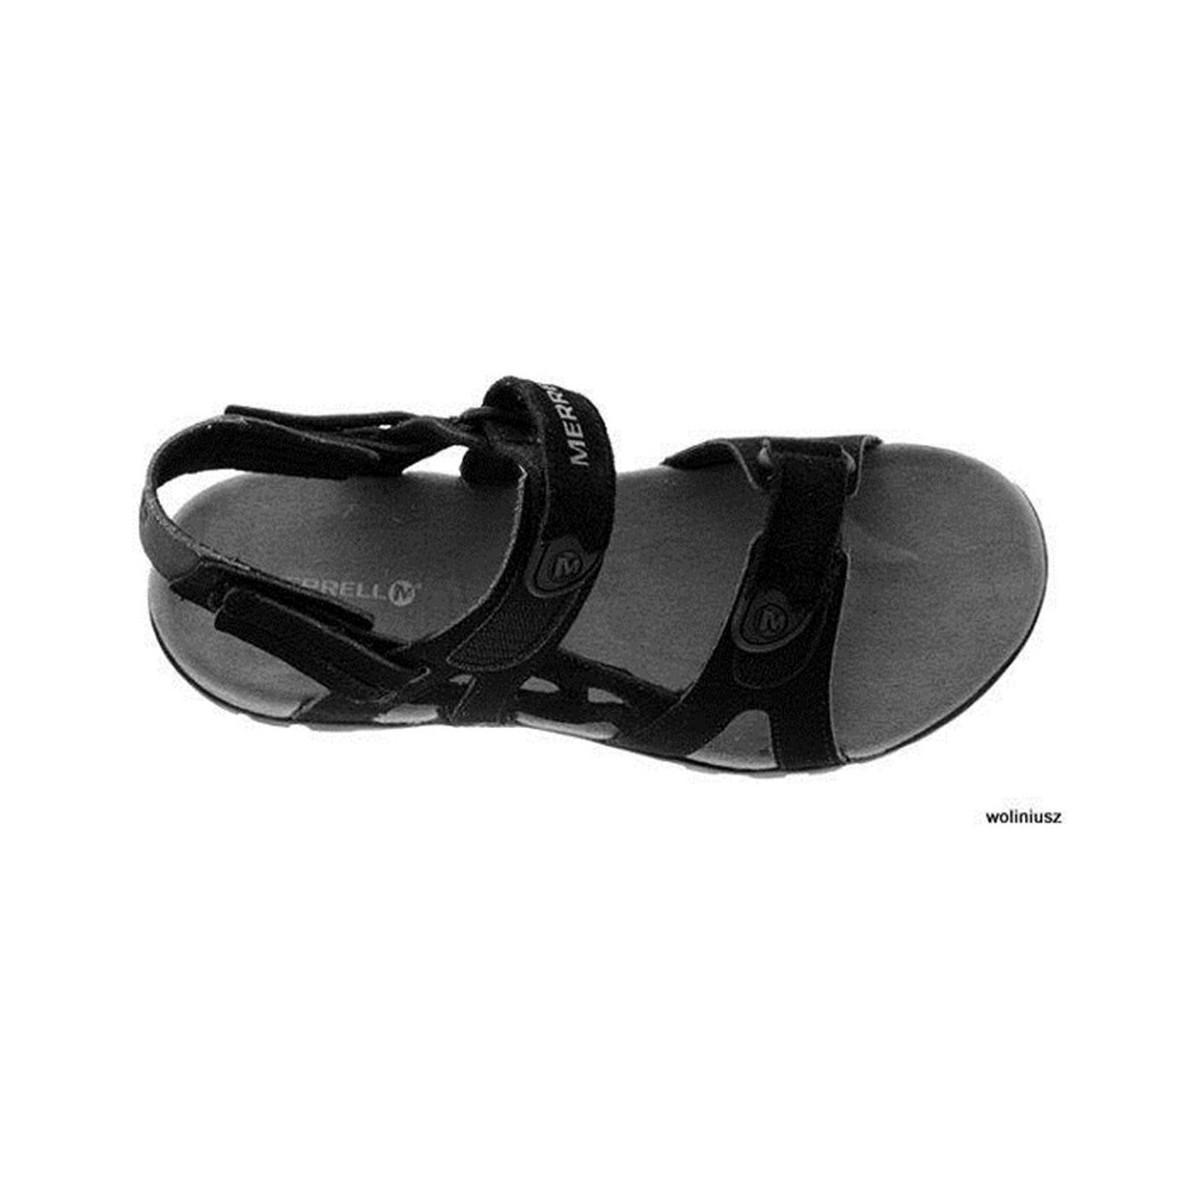 Sandales Merrell Sandspur Convertible J124099 4GU4lwF